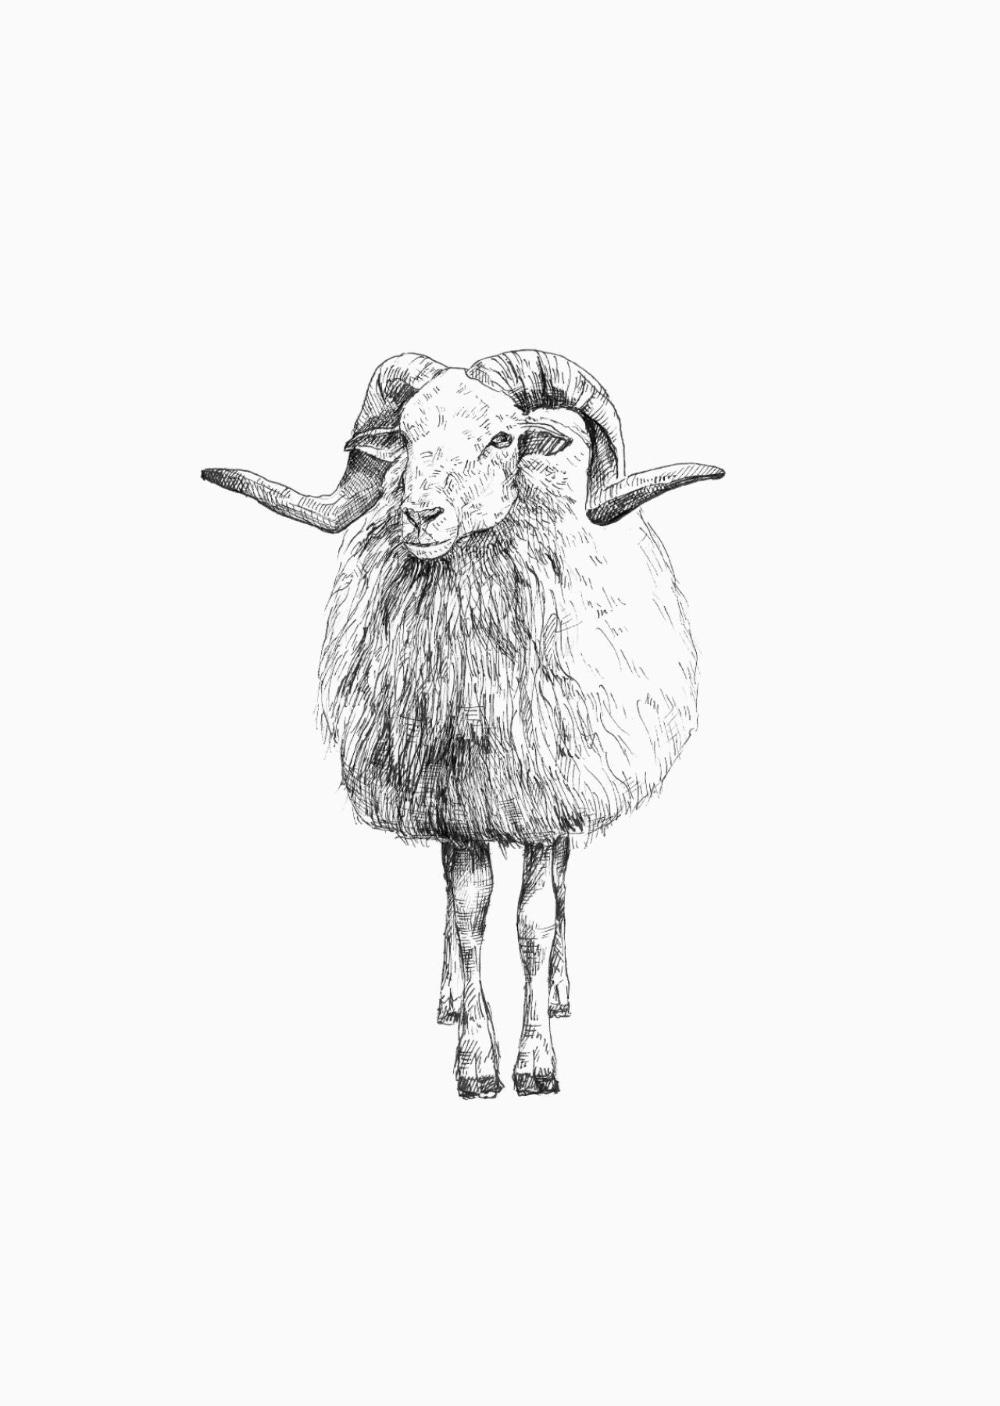 Animals - Drenthe Heath Sheep | Animals, Animal art, Illustration